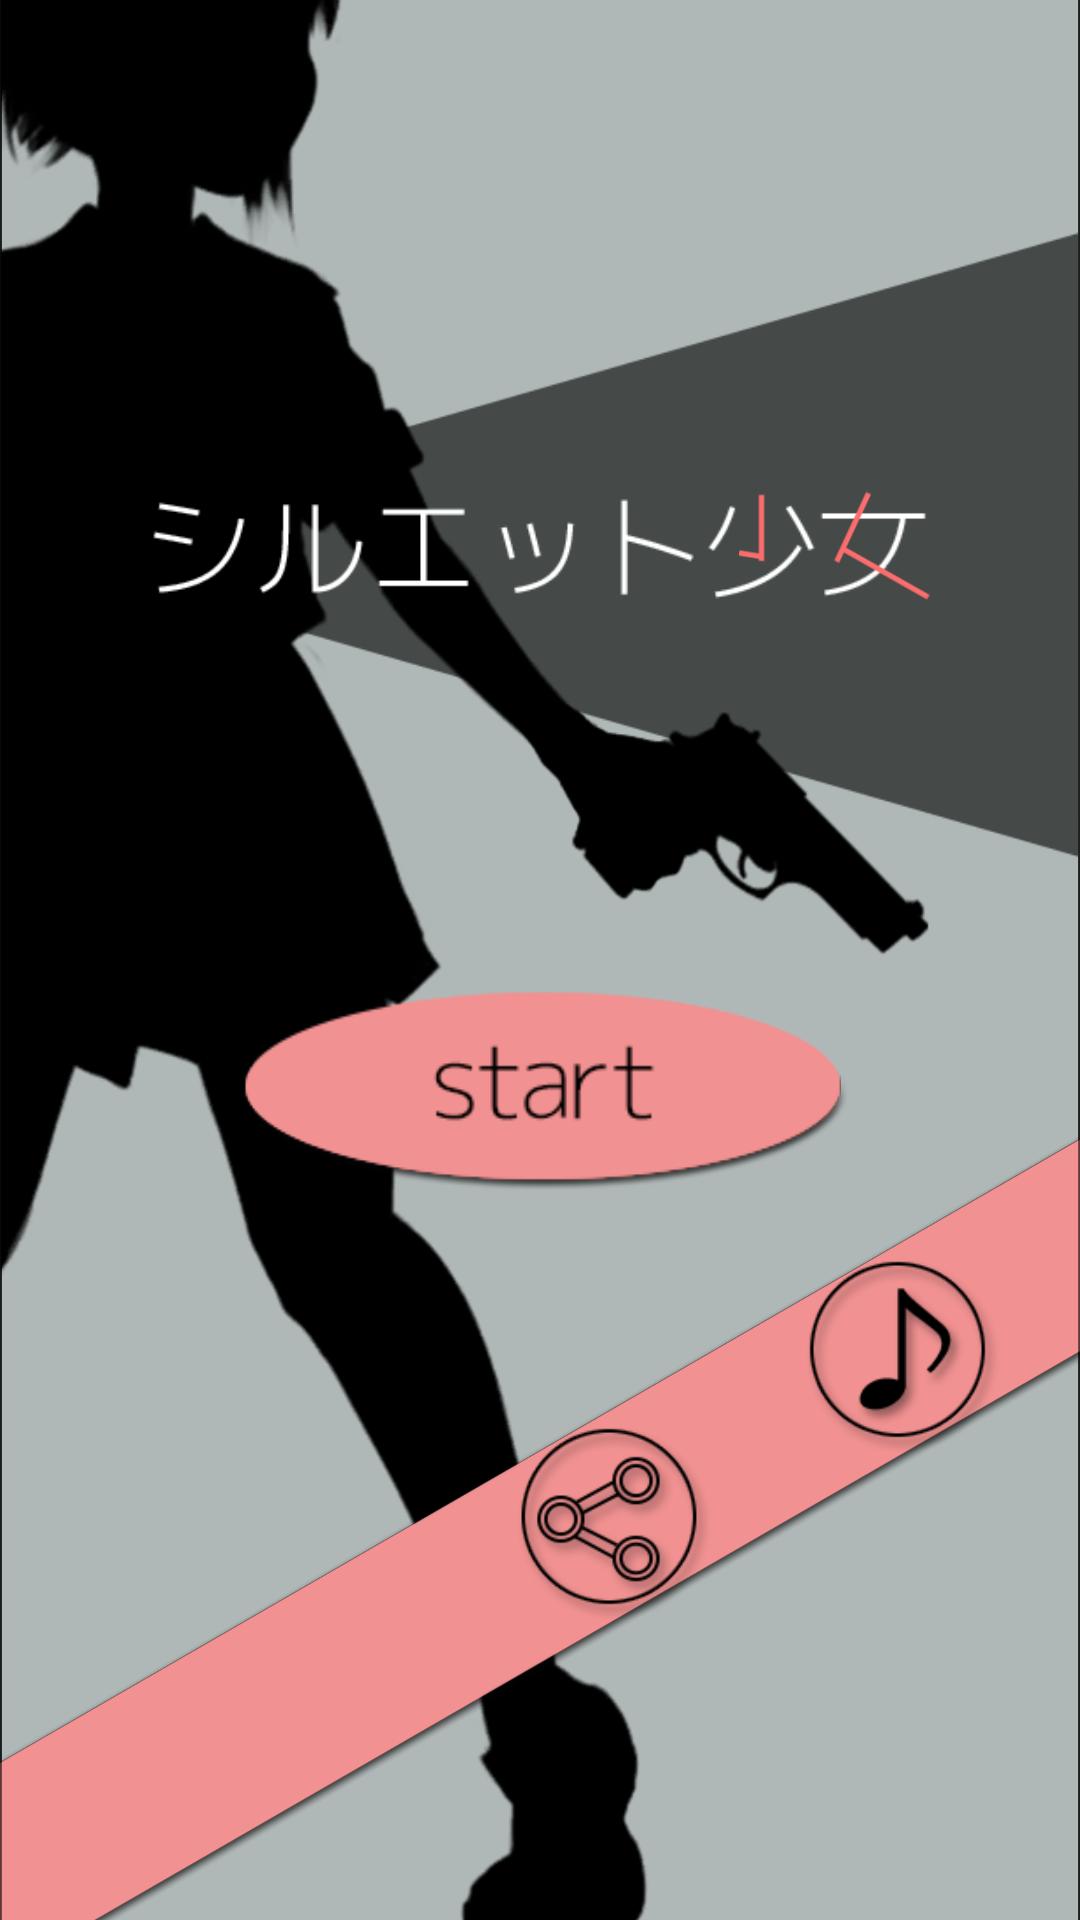 androidアプリ シルエット少女攻略スクリーンショット1